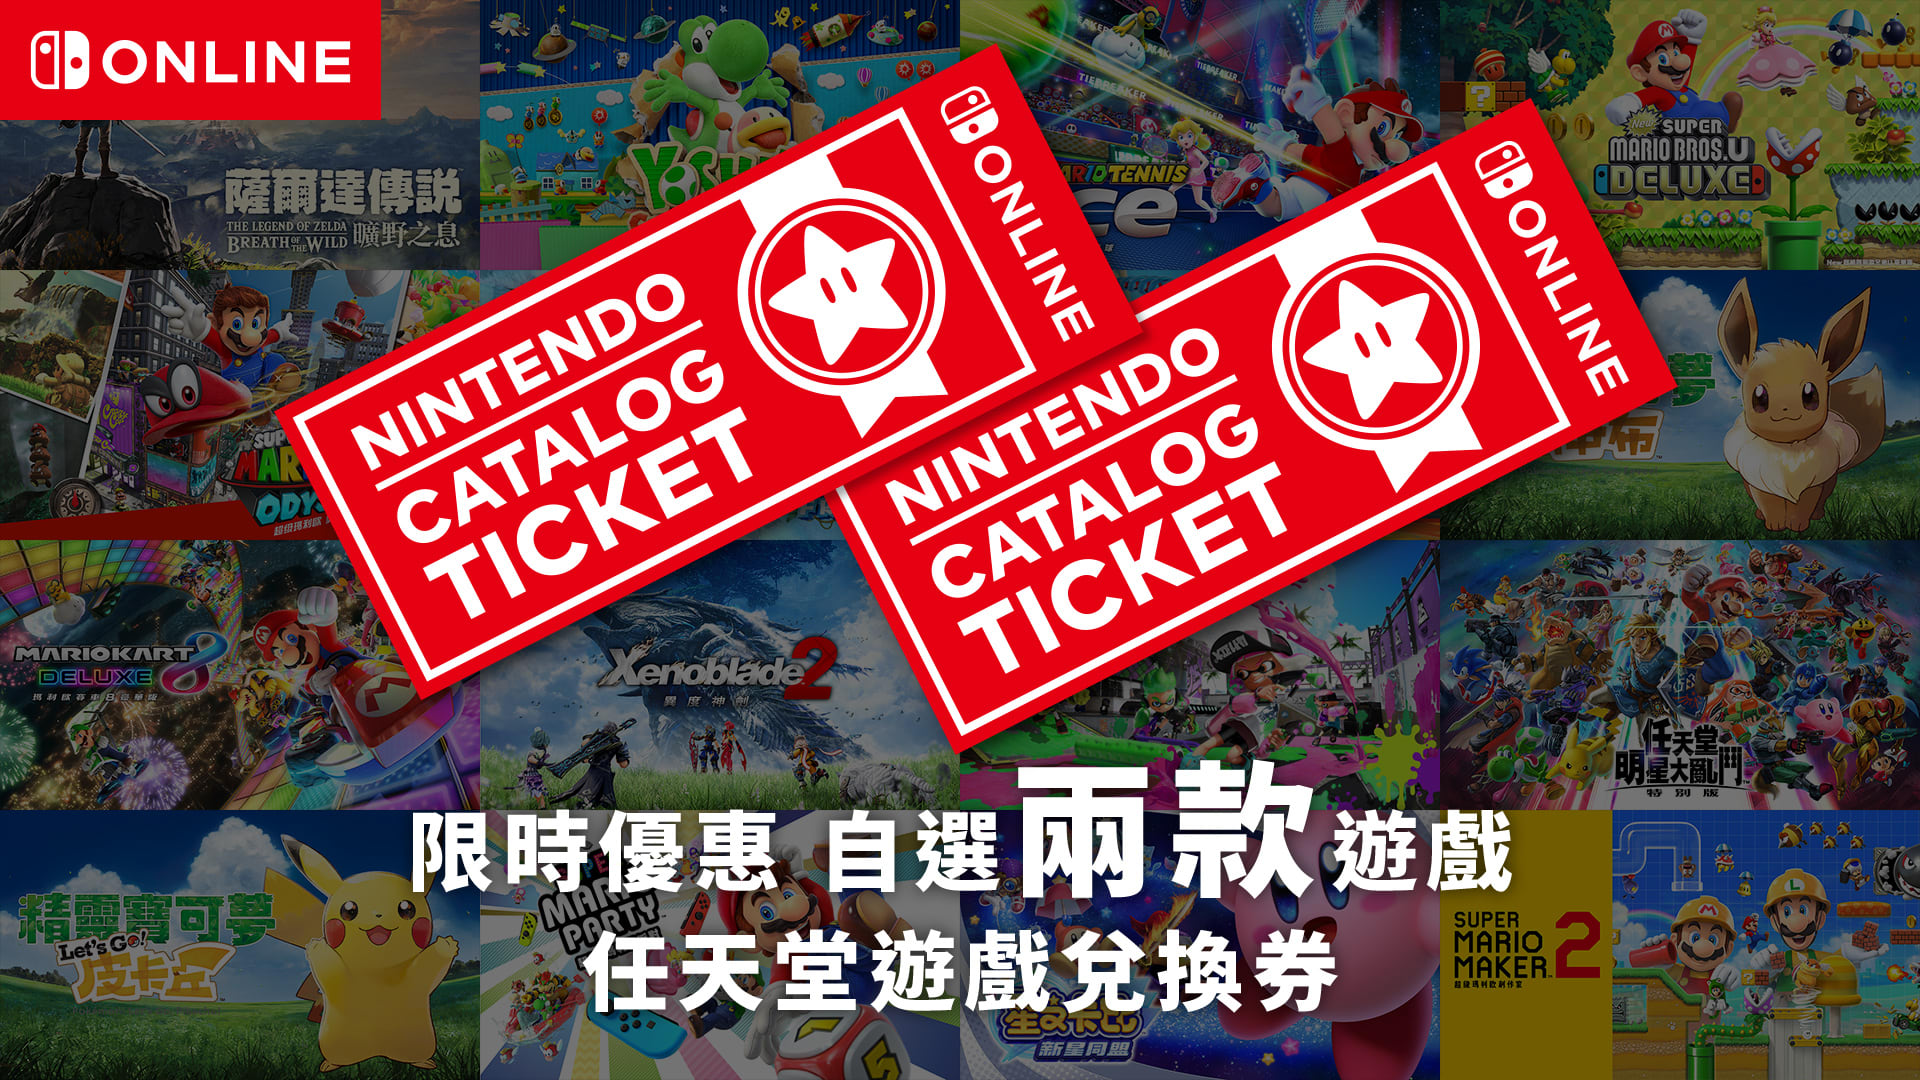 Nintendo switch online ticket